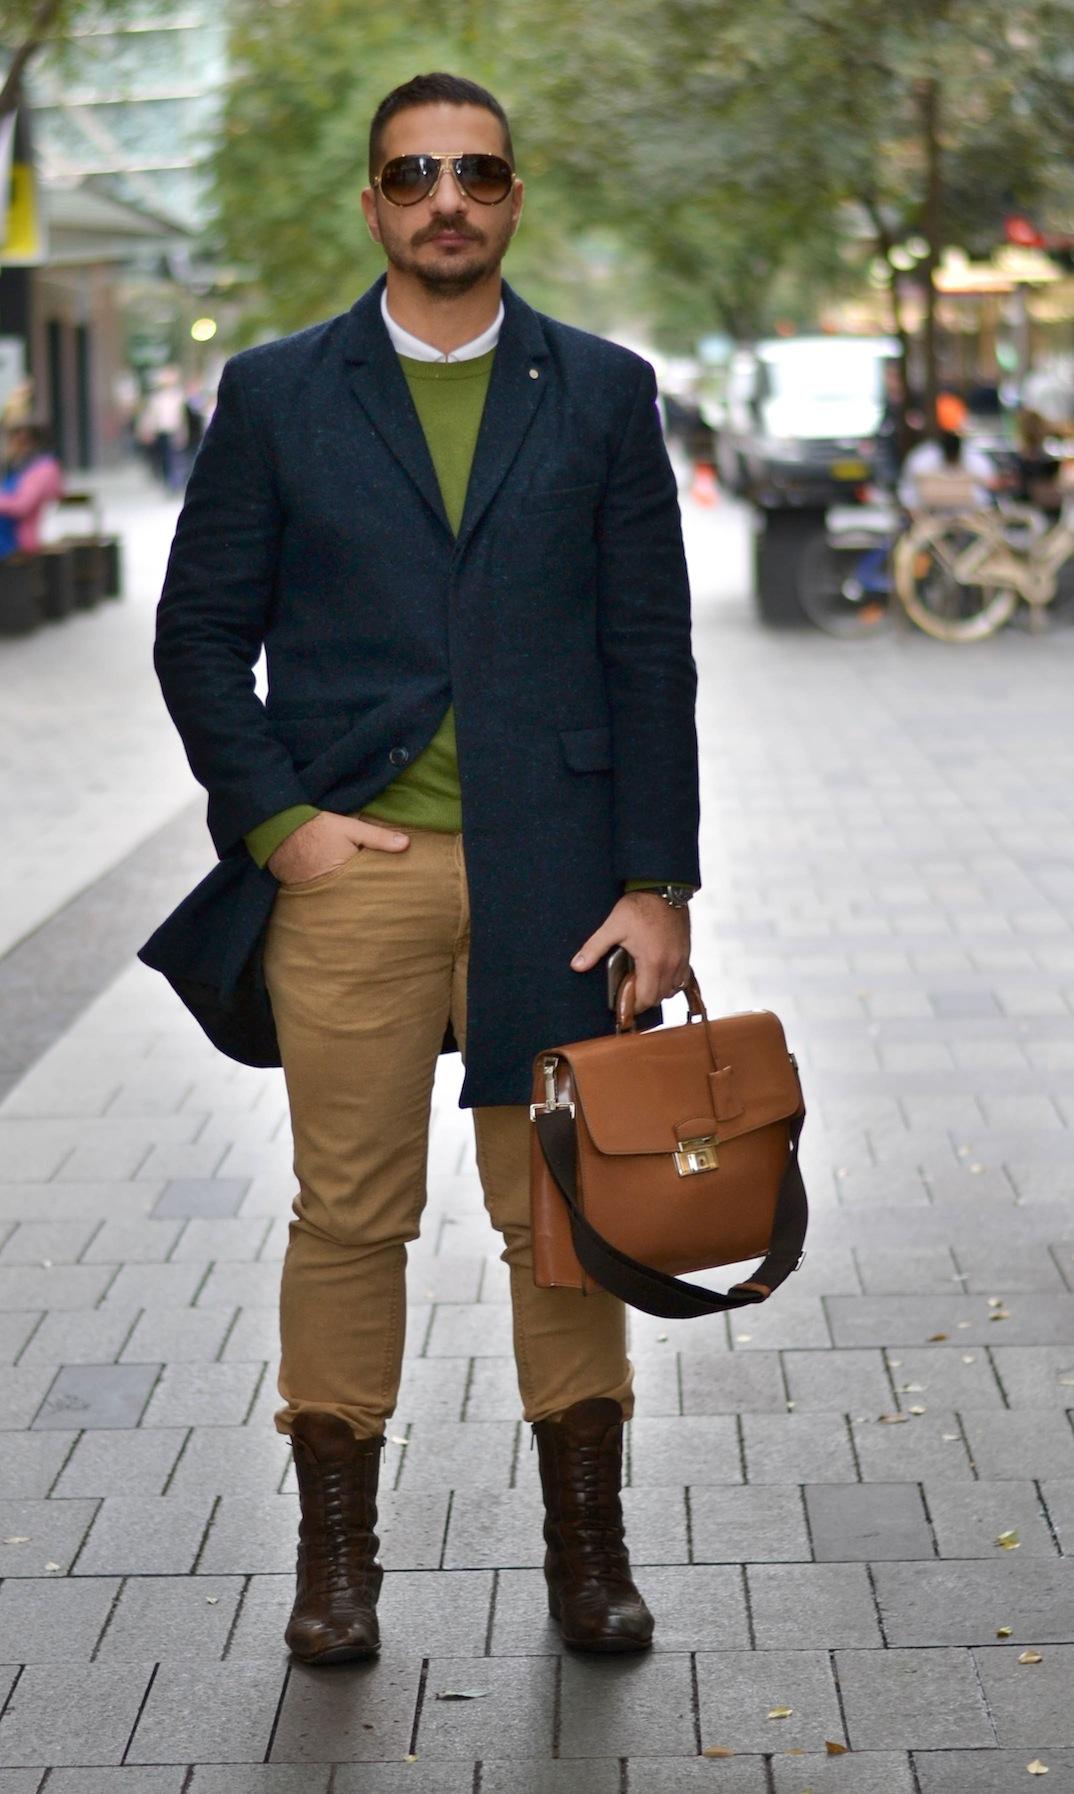 NSW: George Dinkha, stylist, Pitt St Mall, Sydney. Photo: Alice Scriberras.